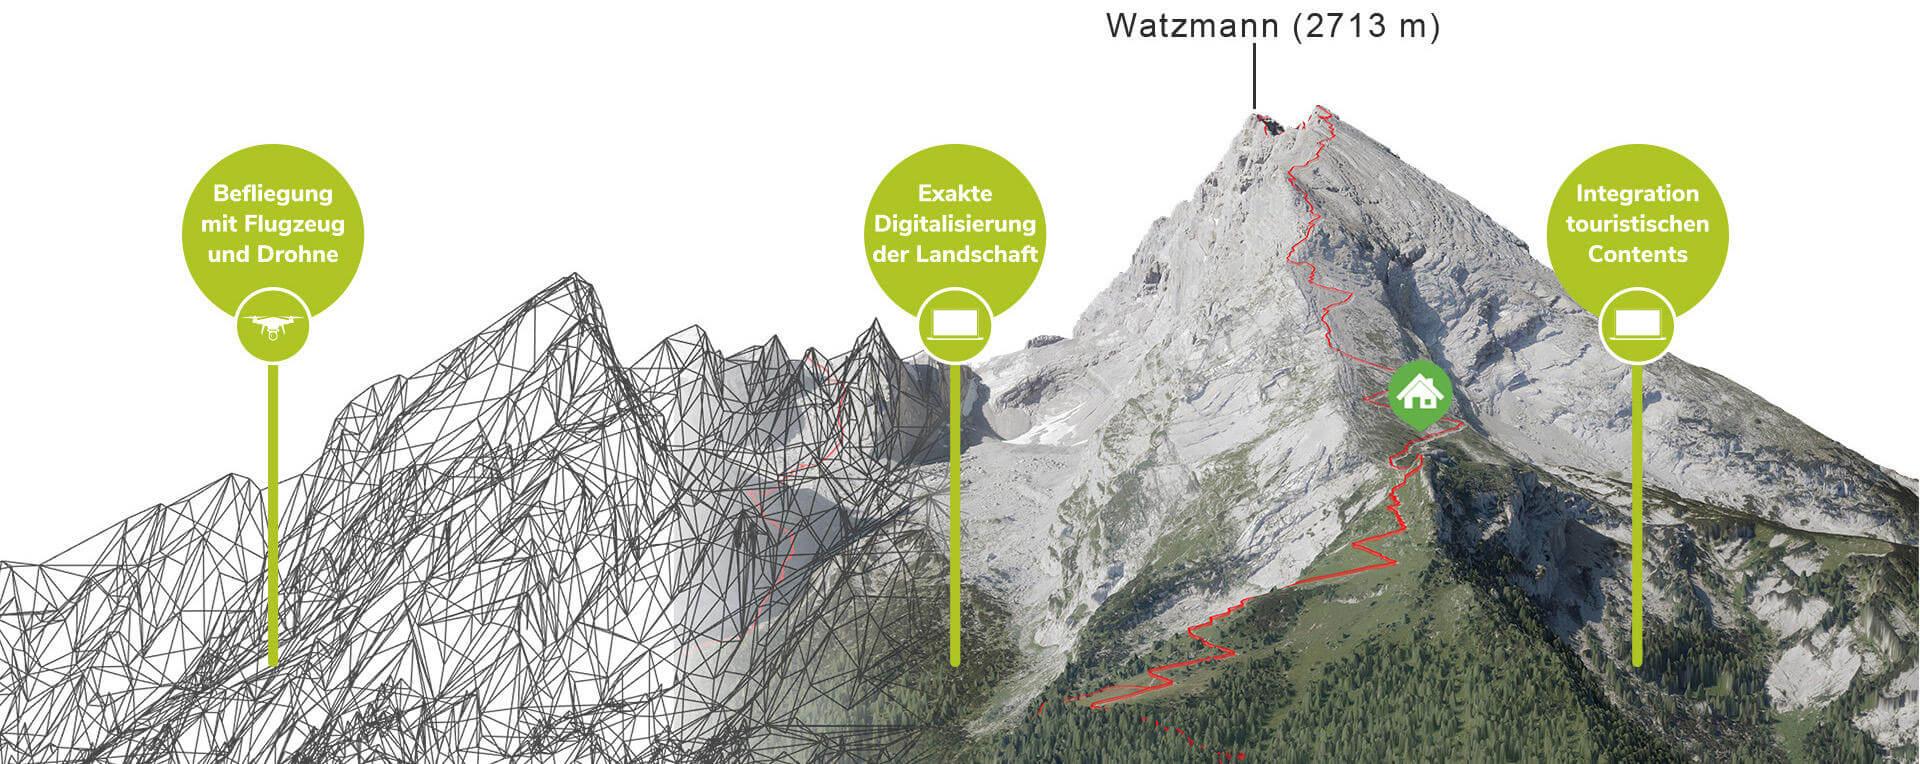 3D Mesh Watzmann